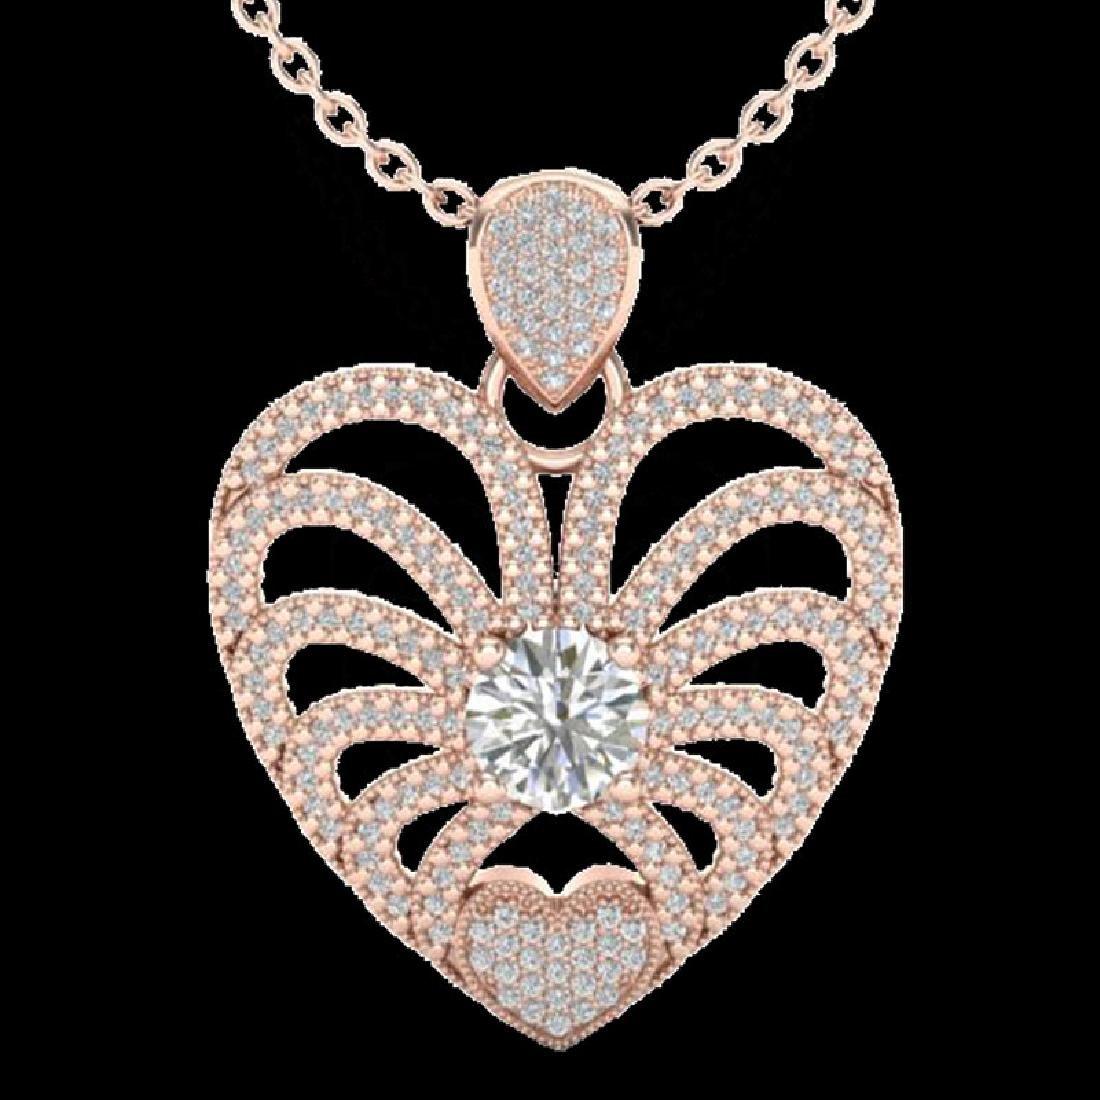 3 CTW Micro Pave VS/SI Diamond Heart Necklace 14K Rose